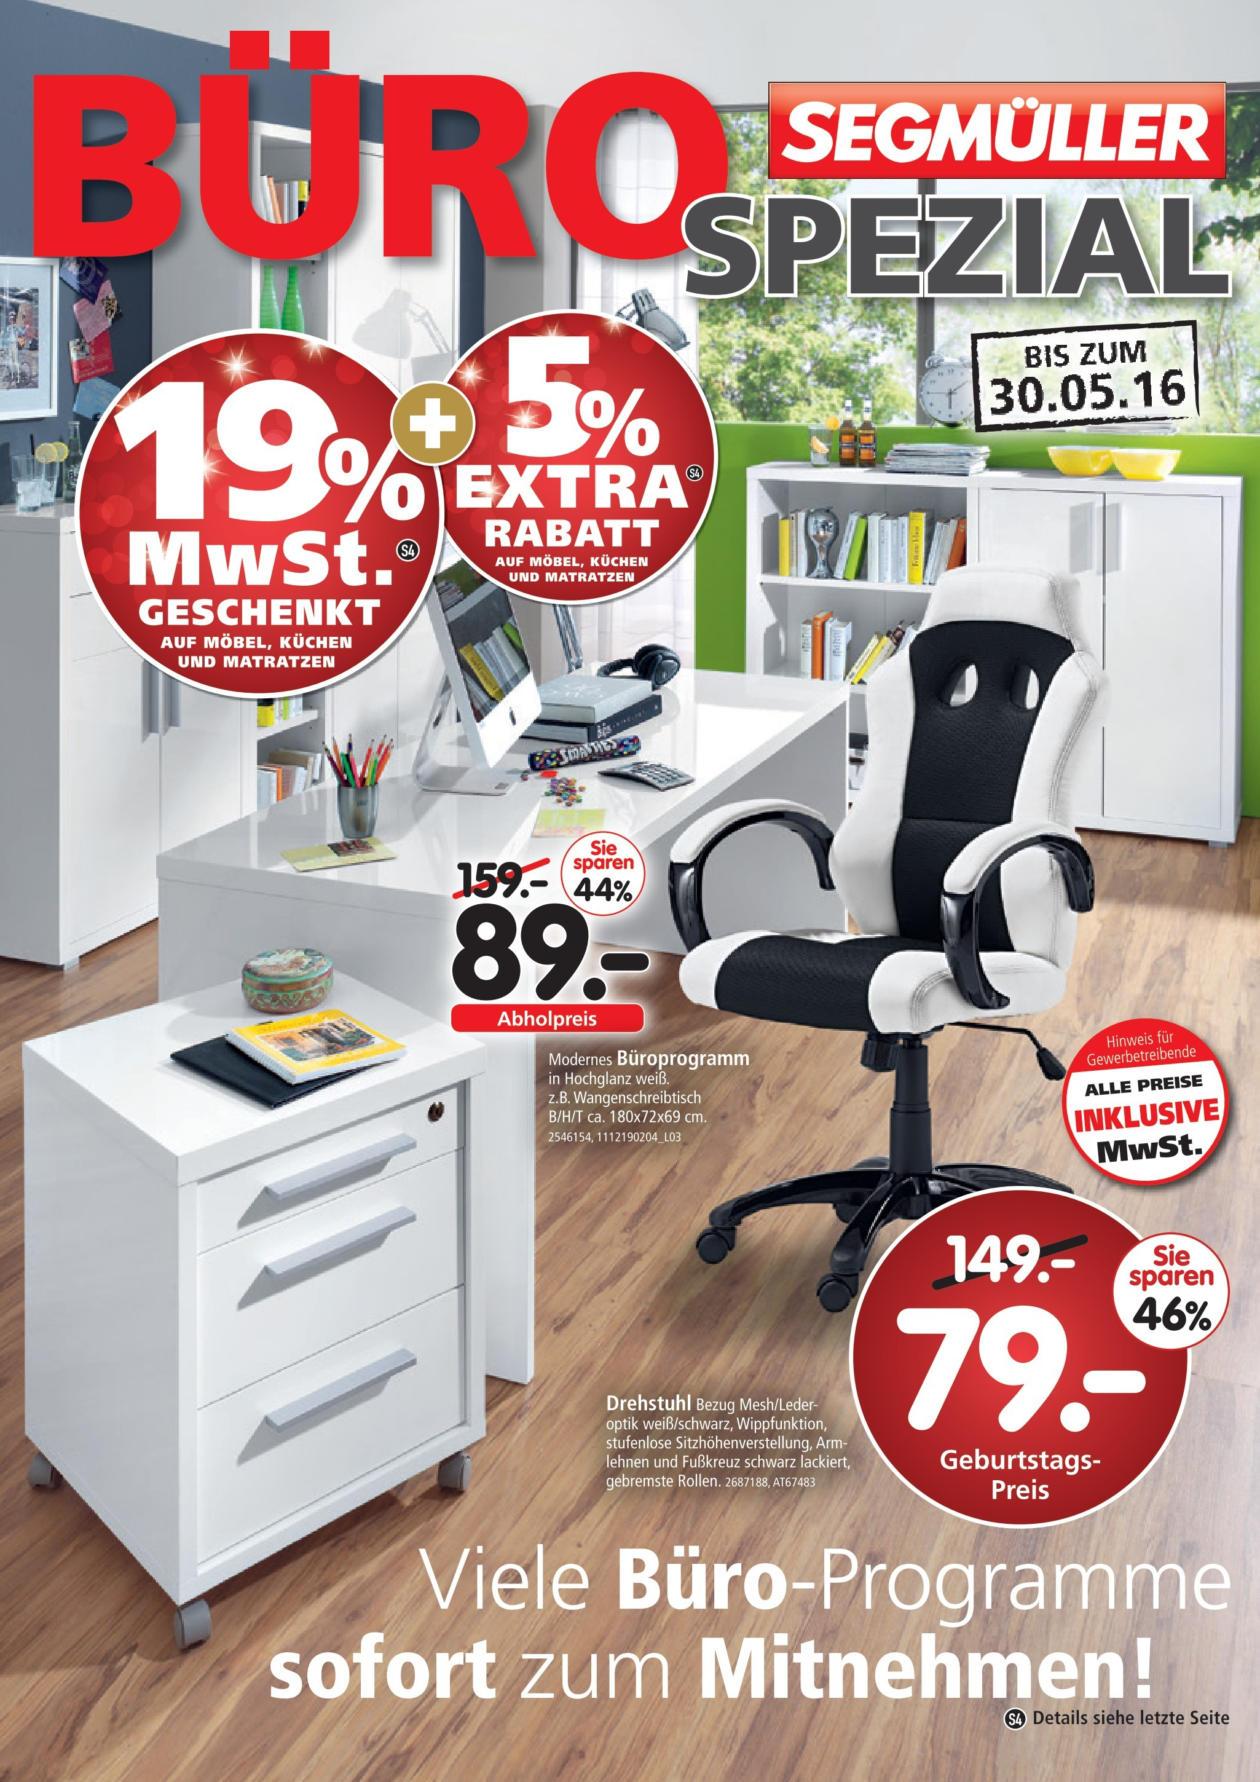 teppich kibek berlin spandau teppich kibek berlin spandau verkaufsoffener sonntag teppiche. Black Bedroom Furniture Sets. Home Design Ideas